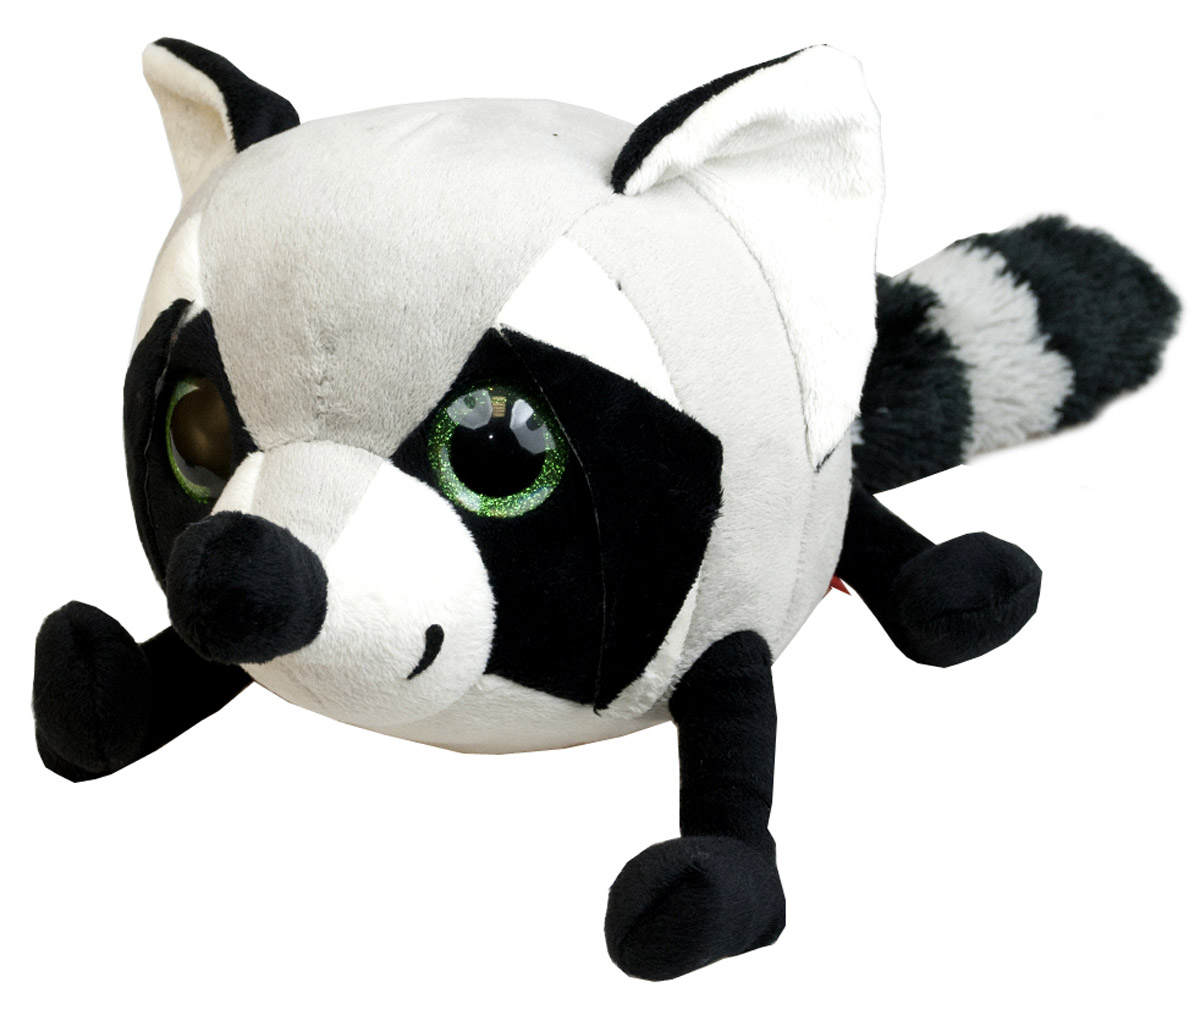 Fancy Мягкая игрушка Енот 21 см малышарики мягкая игрушка собака бассет хаунд 23 см